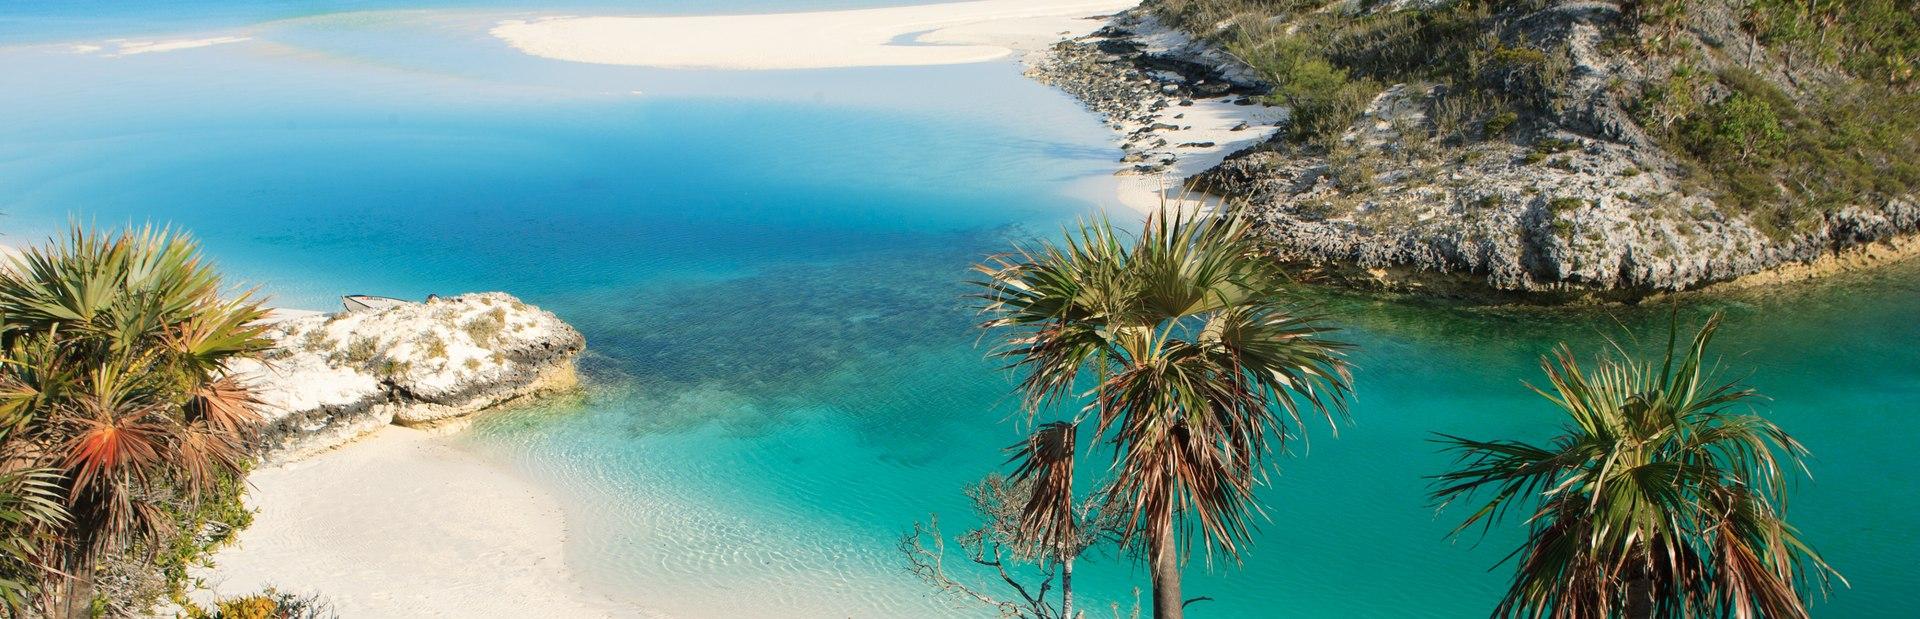 Shroud Cay guide